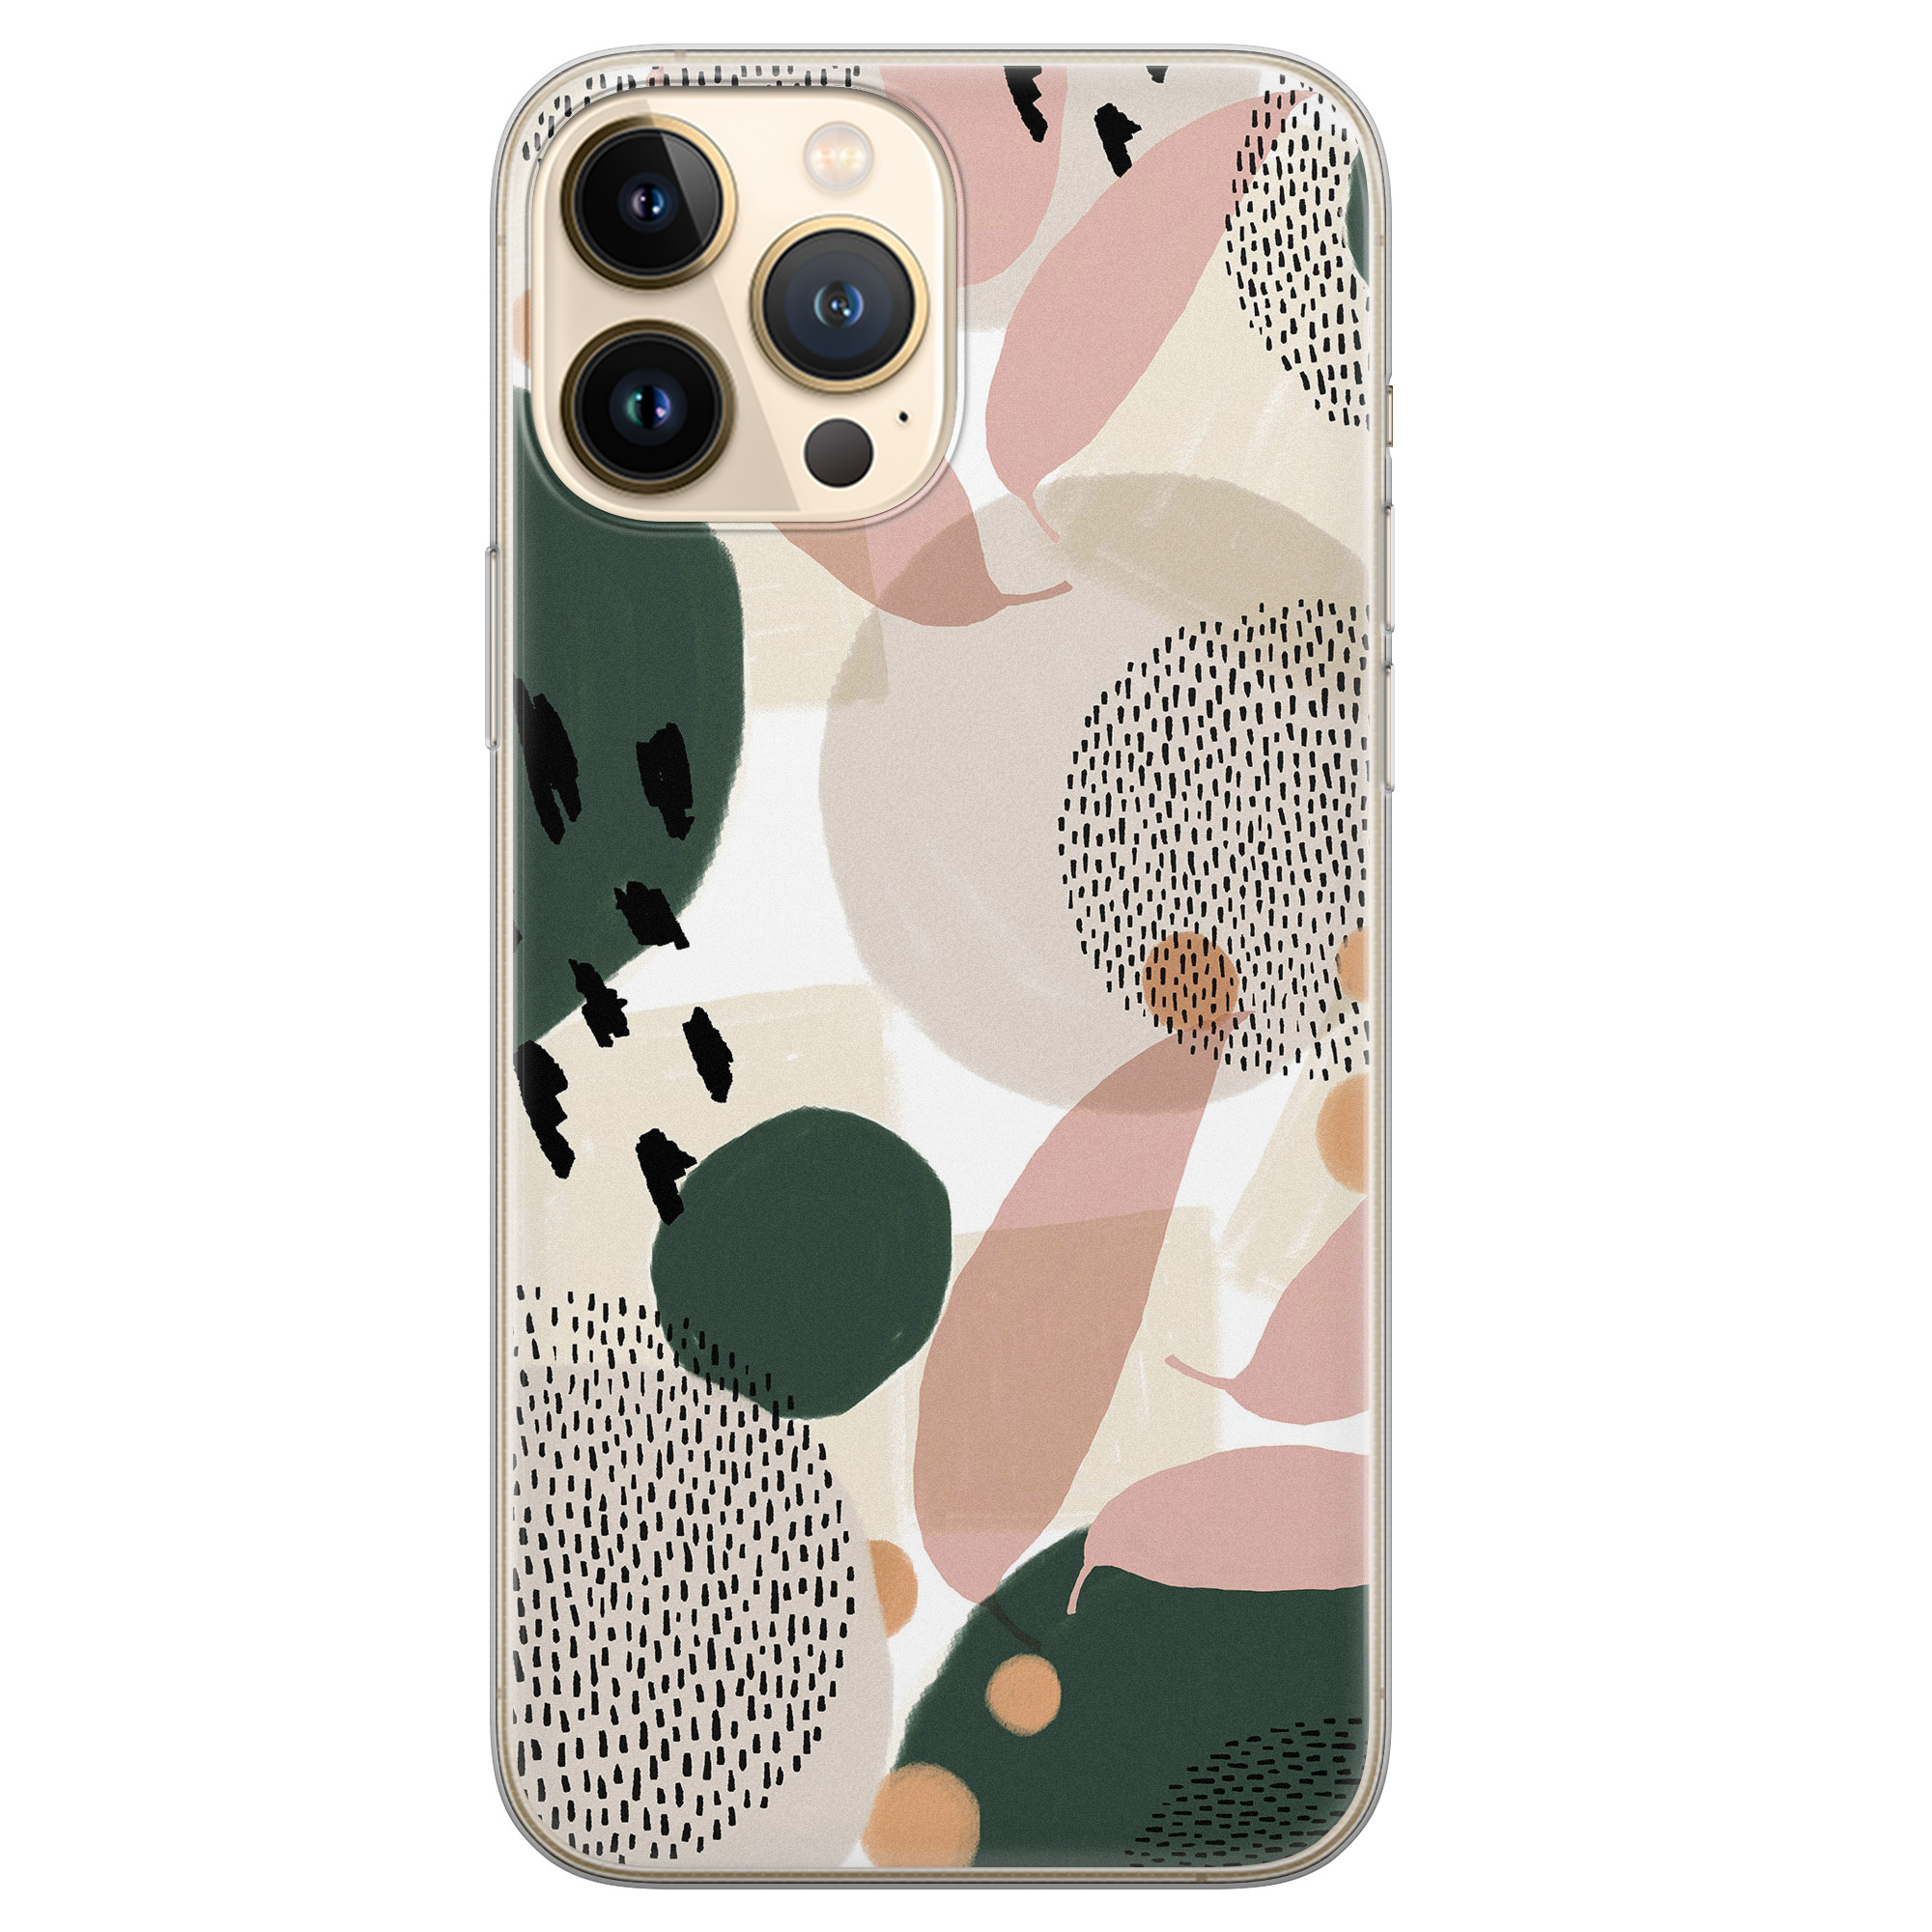 Leuke Telefoonhoesjes iPhone 13 Pro Max siliconen hoesje - Abstract print